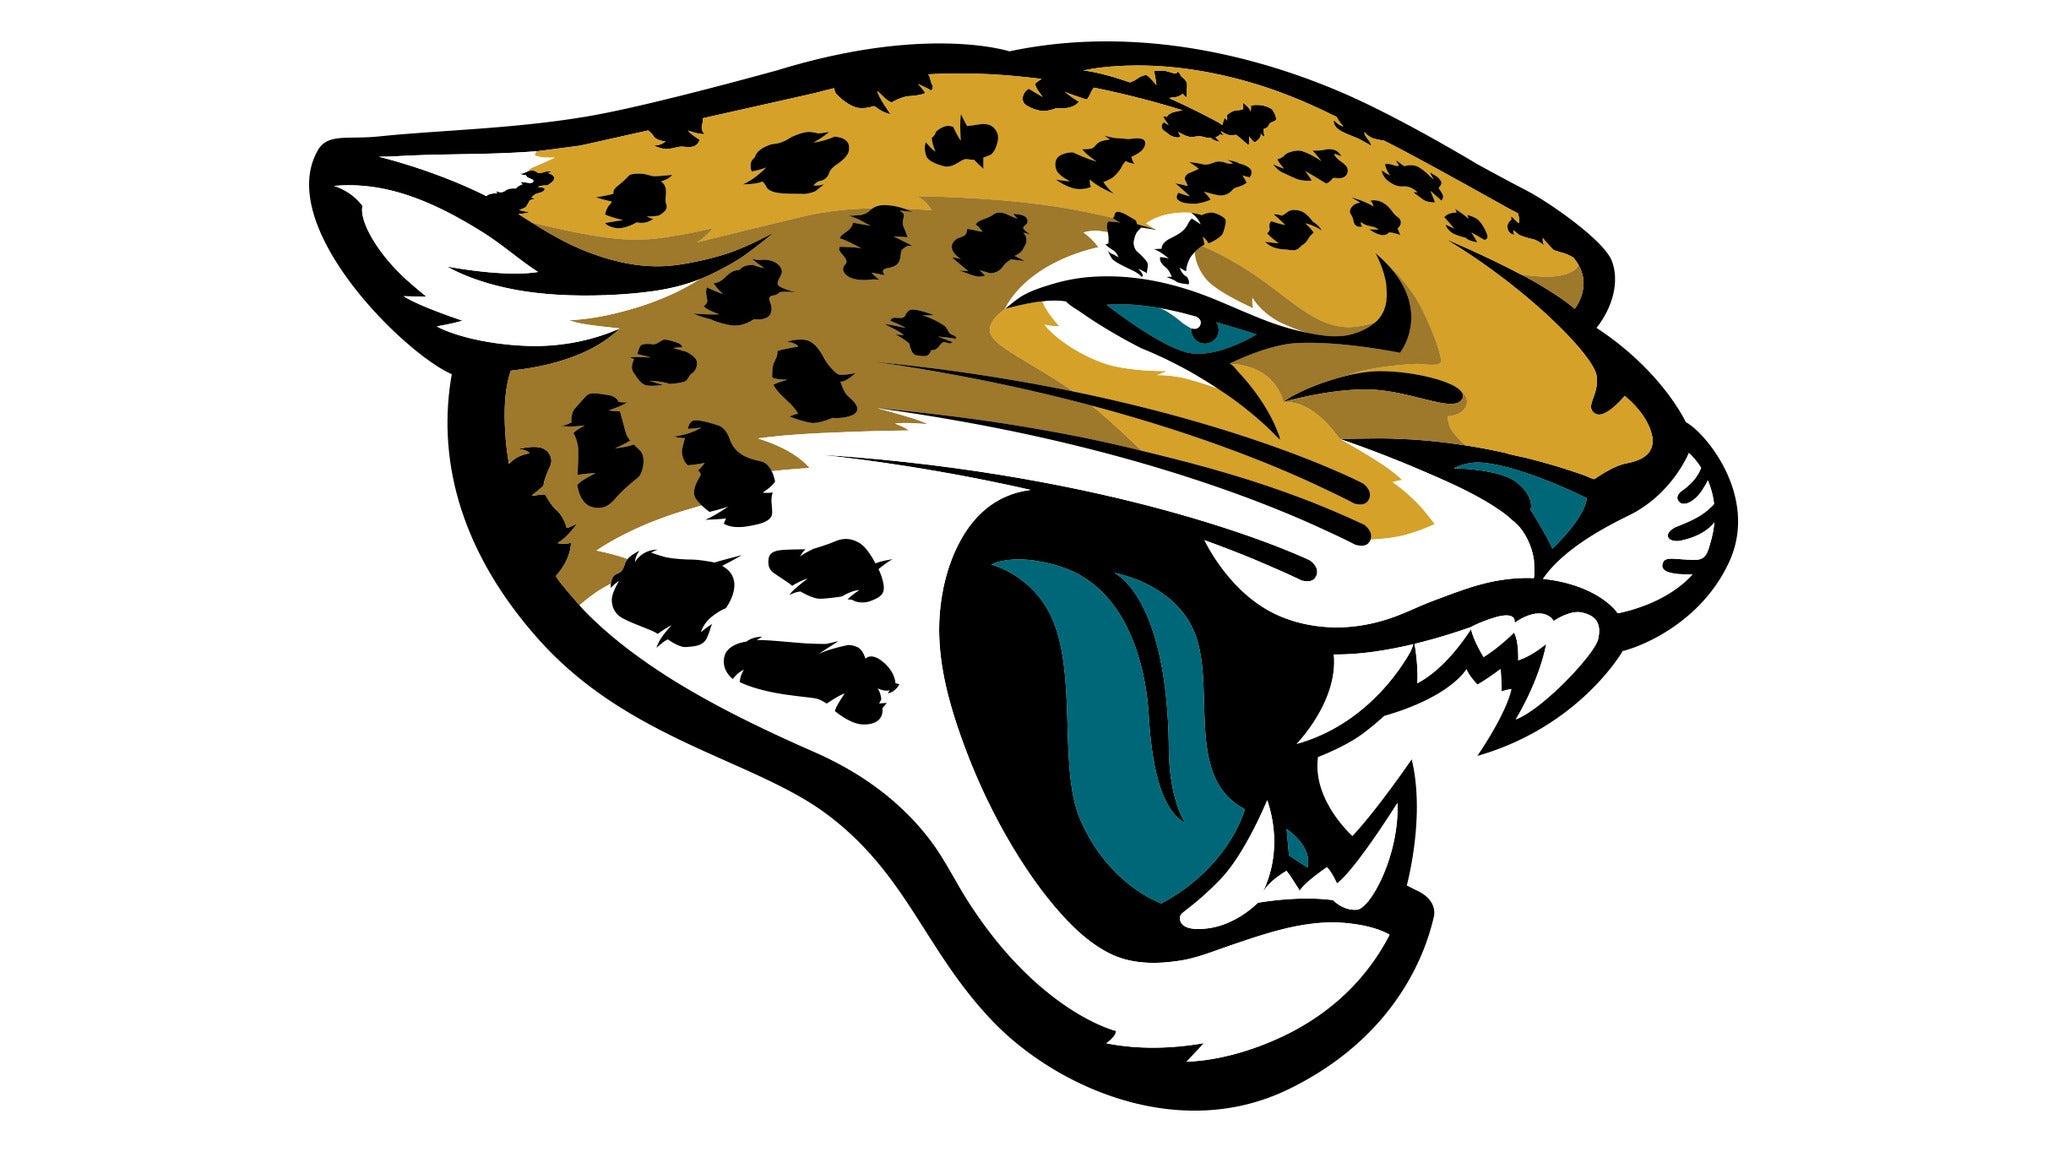 Jacksonville Jaguars vs. New York Jets at TIAA Bank Field